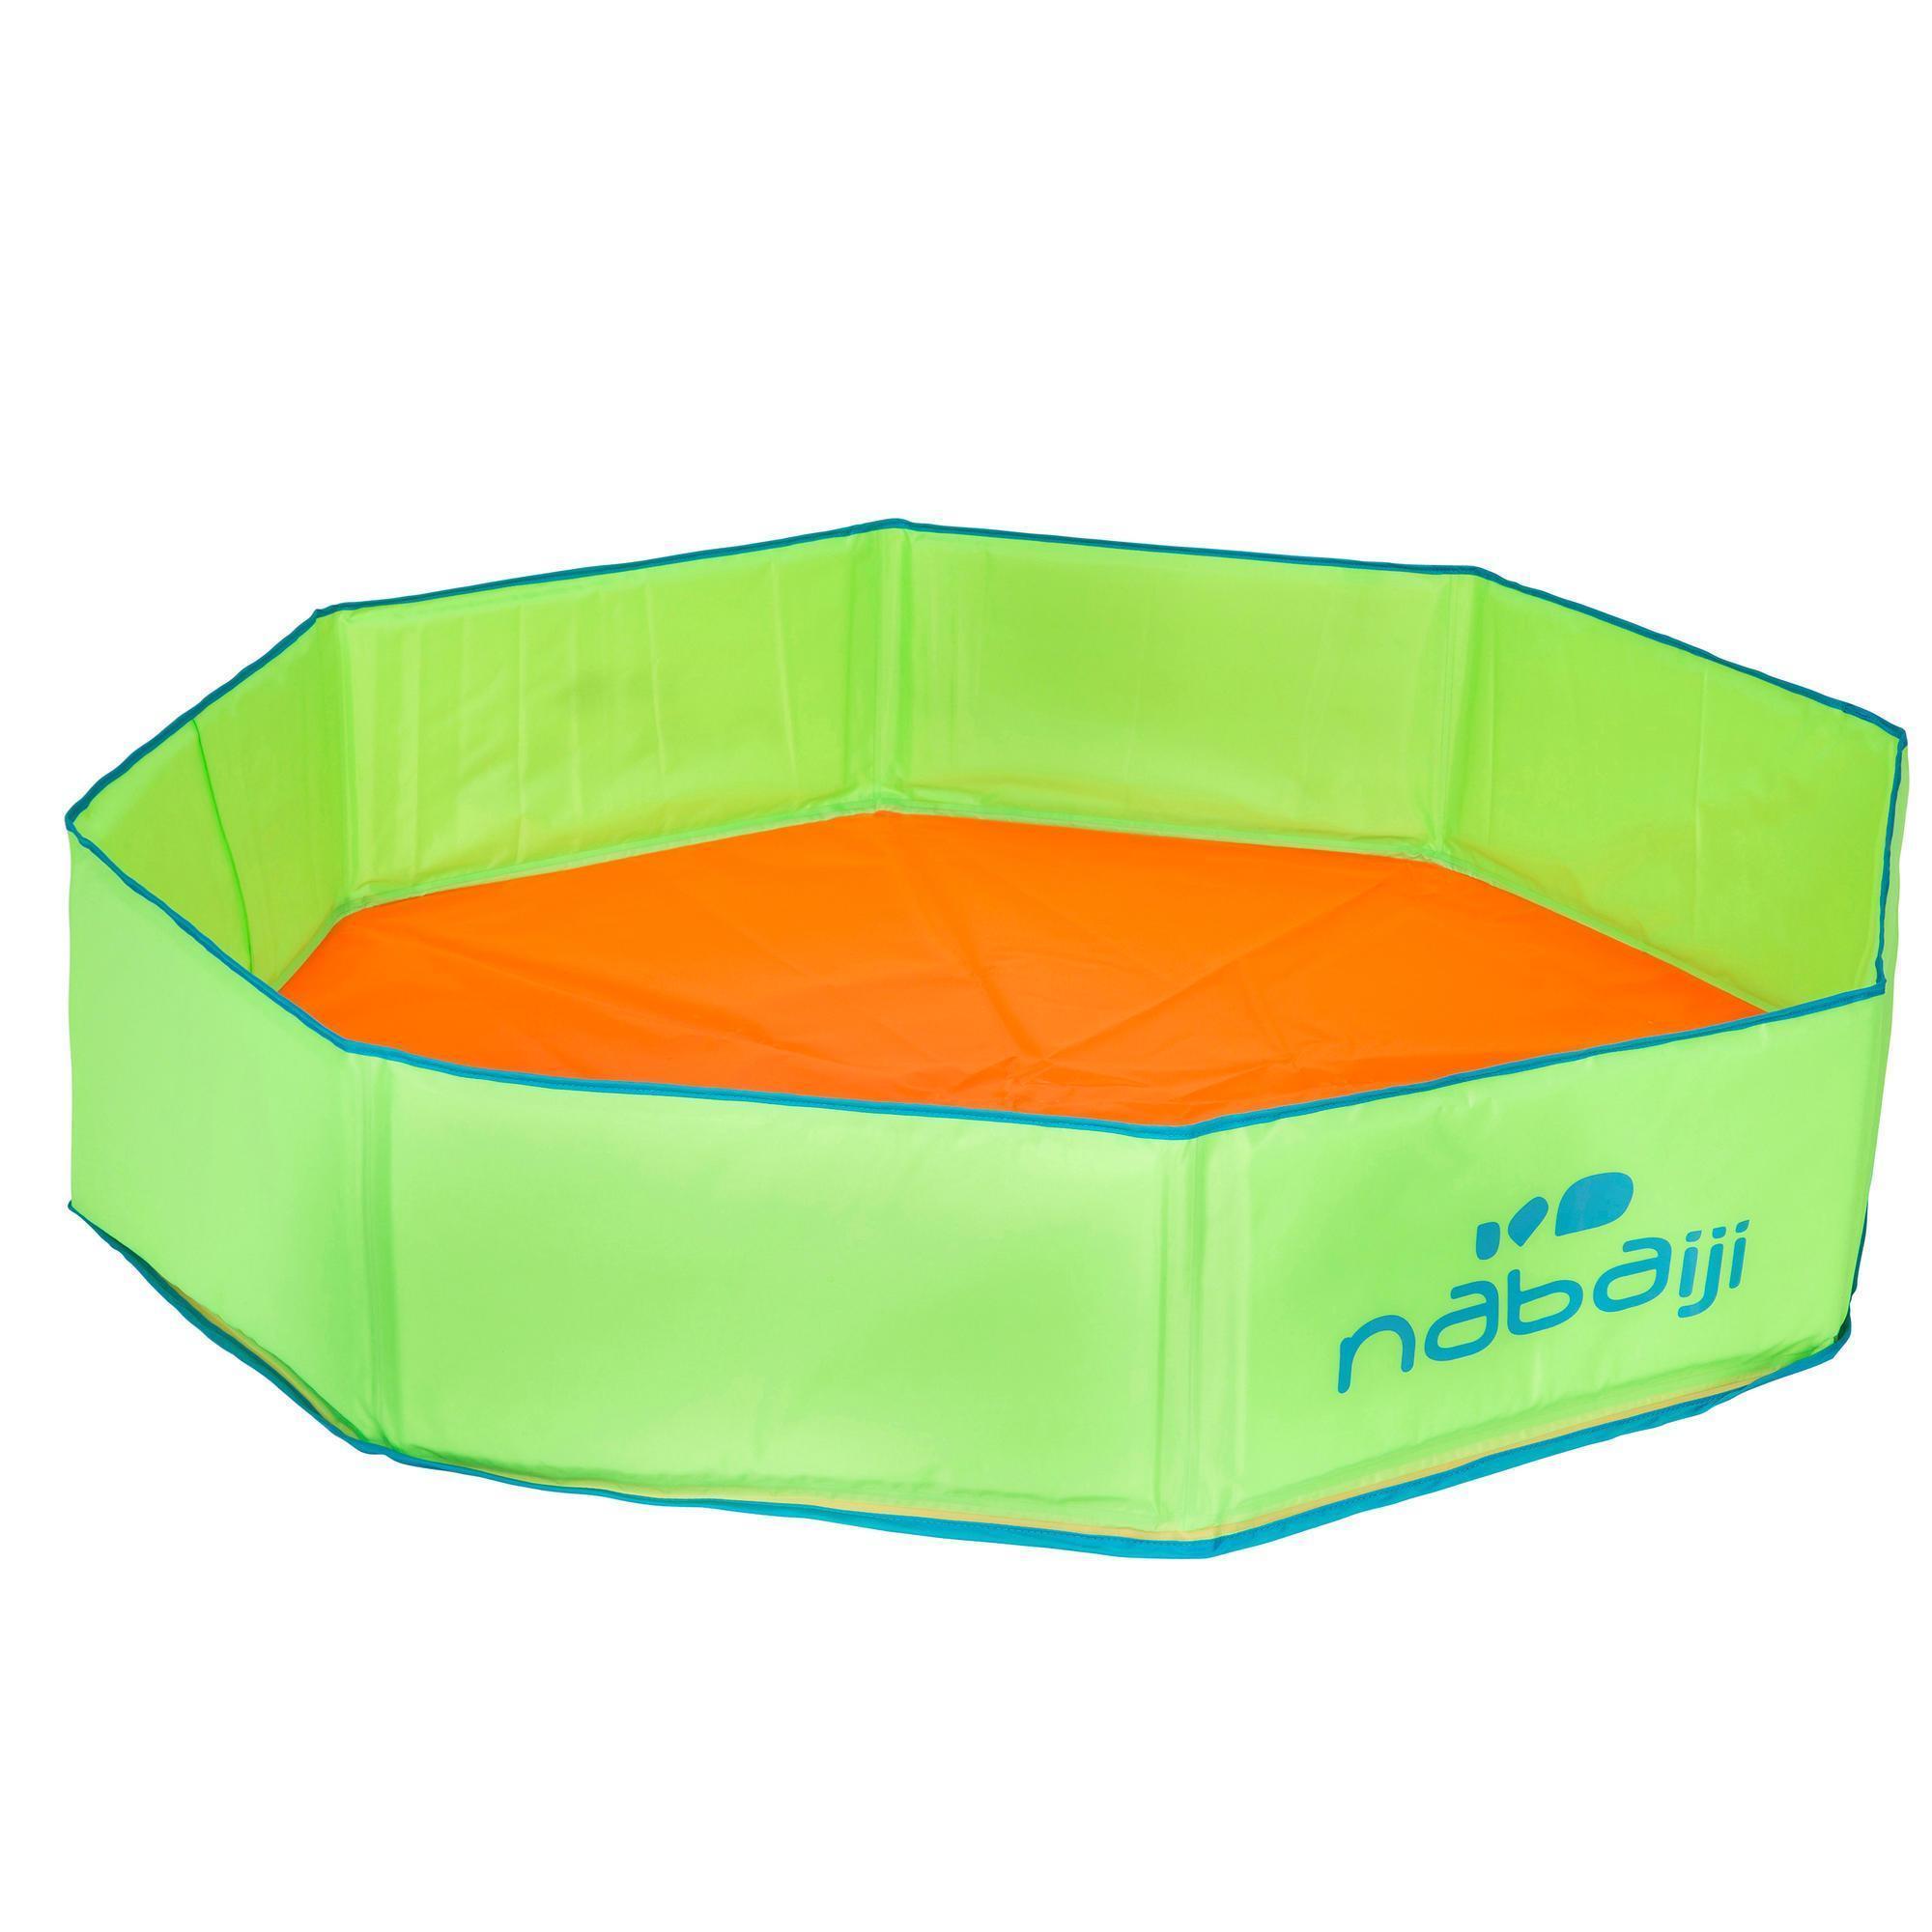 petite piscine enfant tidipool verte et orange avec sac. Black Bedroom Furniture Sets. Home Design Ideas